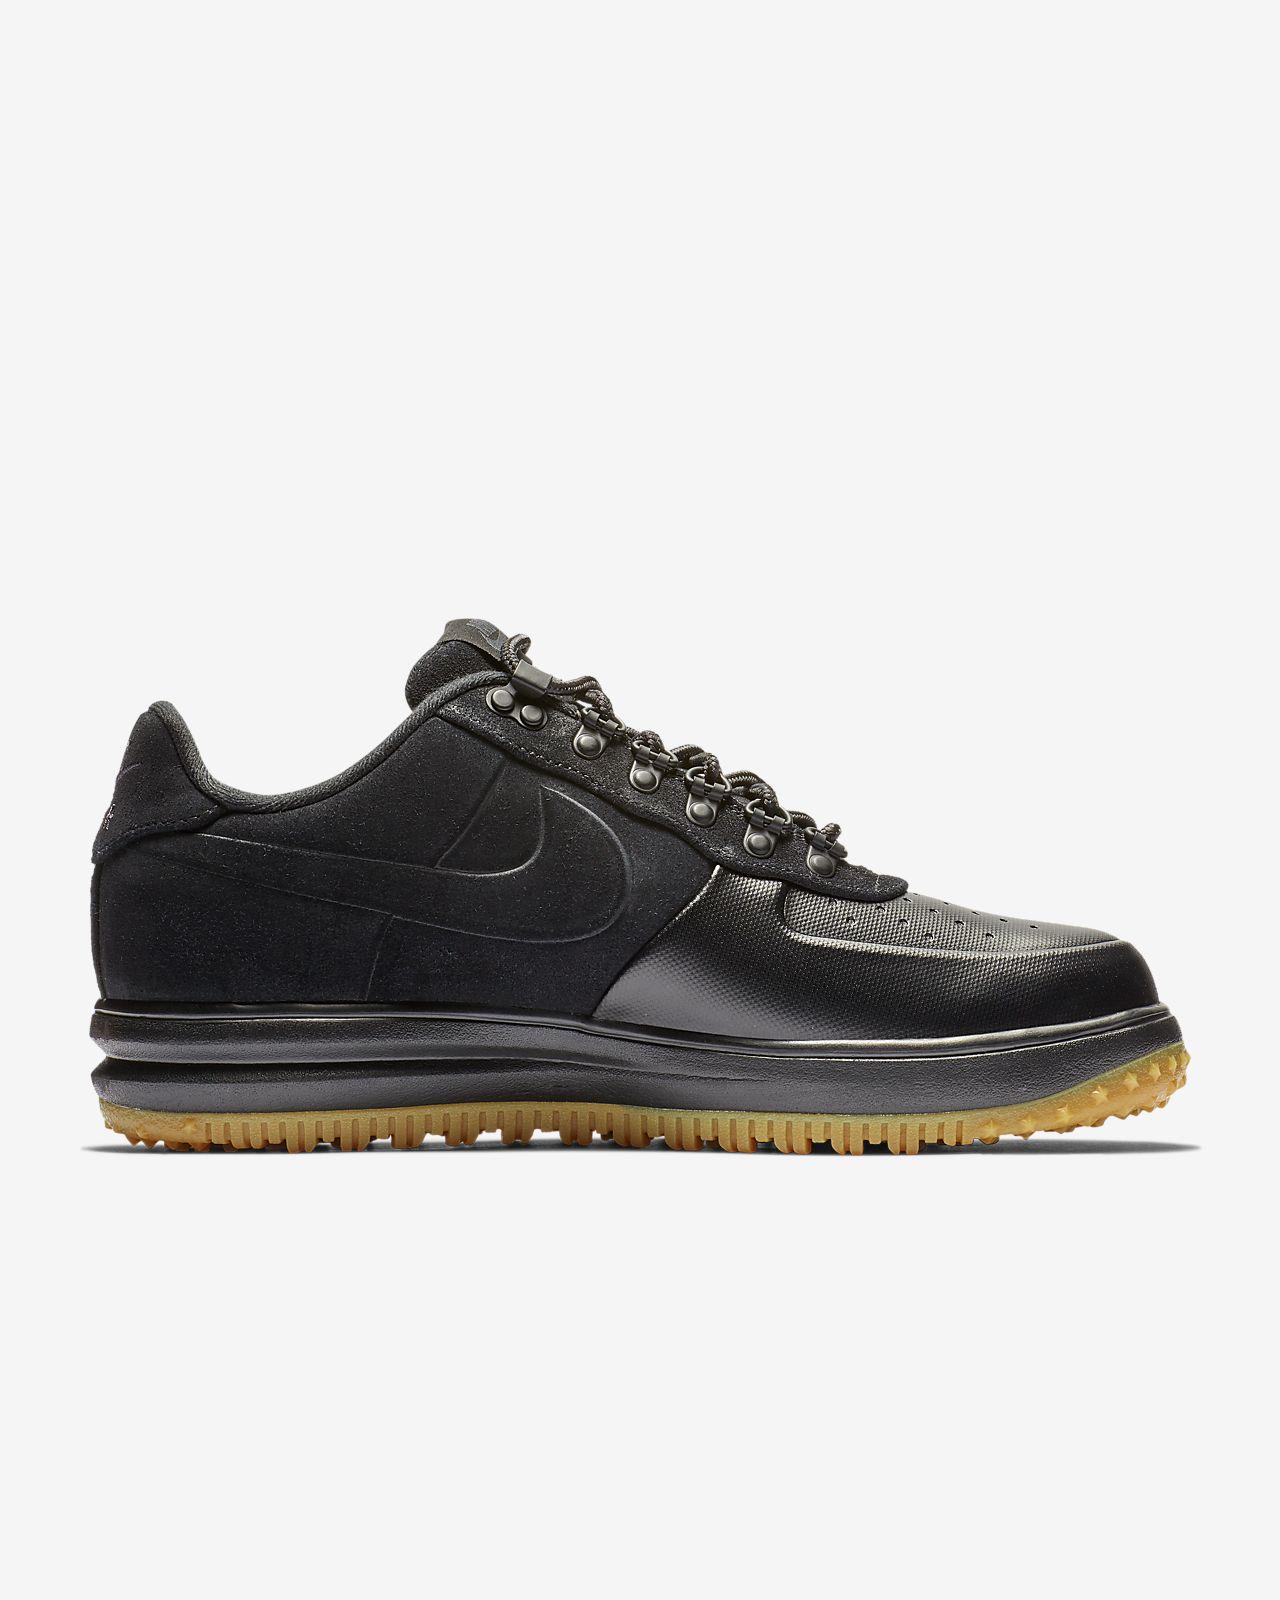 sports shoes c6952 18200 ... Calzado para hombre Nike Lunar Force 1 Duckboot Low